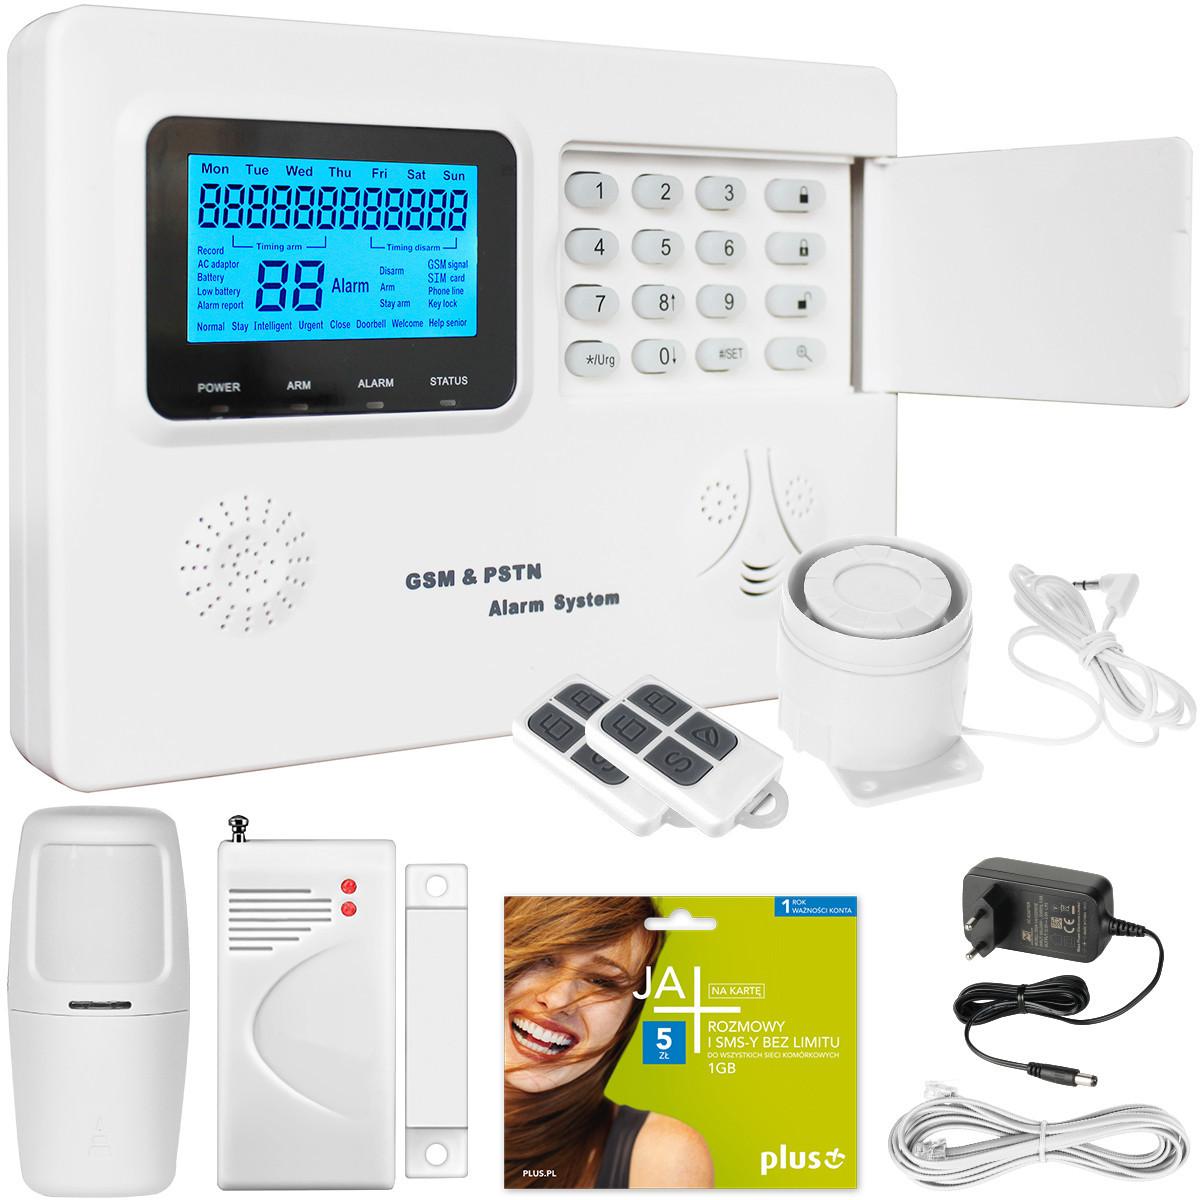 Alarm domowy GSM RED III McDowell